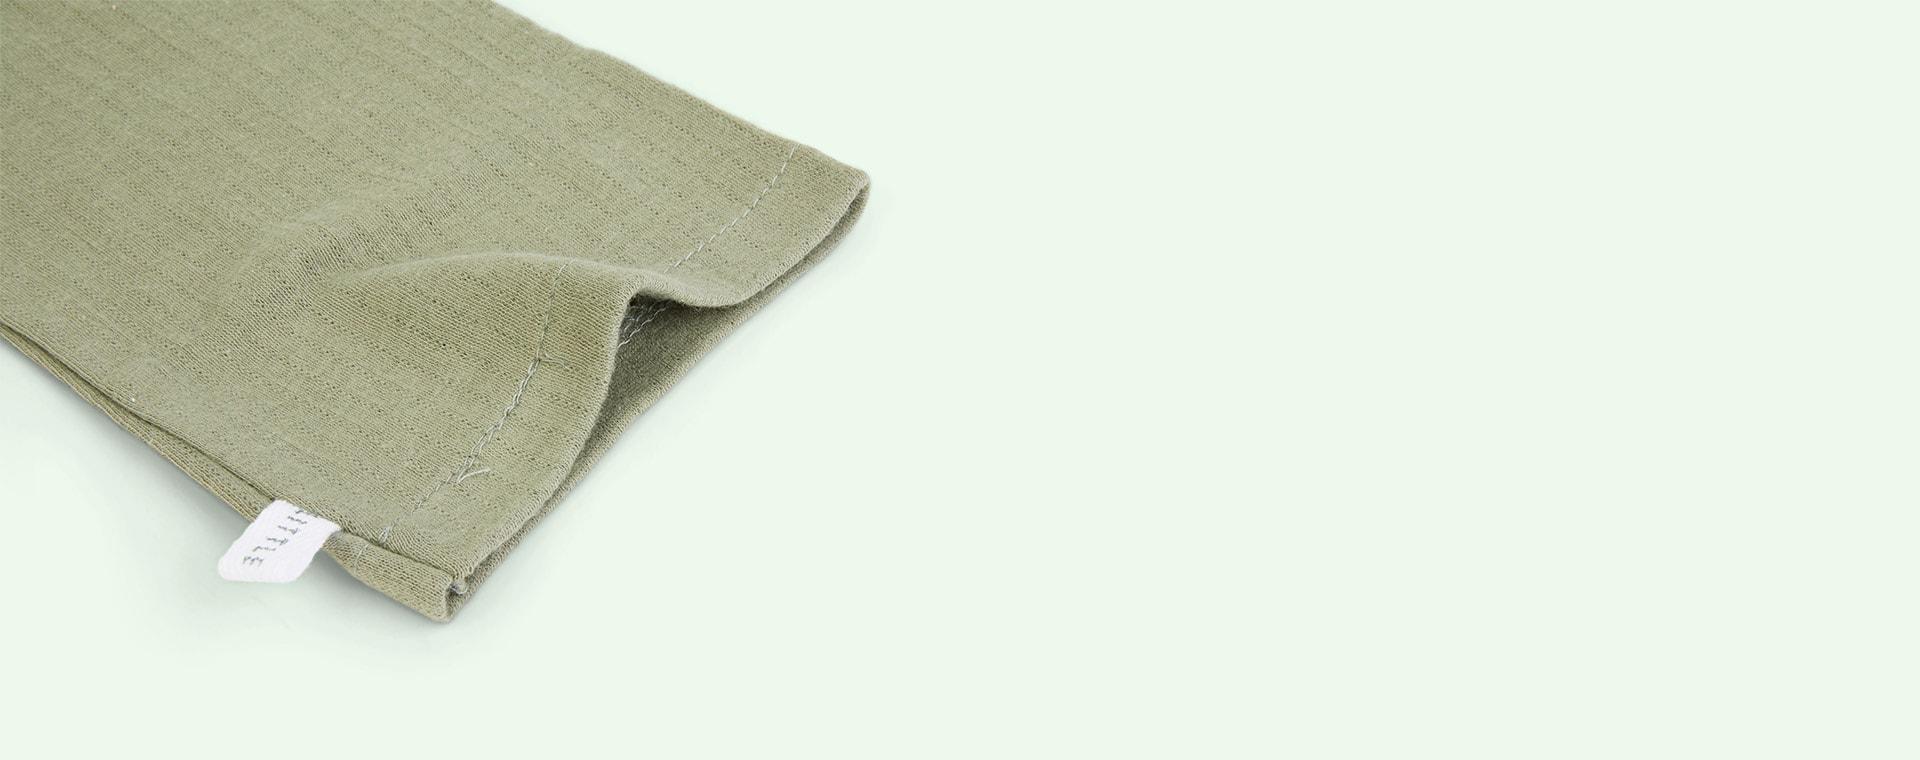 Little Goose Little Dutch 3-pack Washcloths